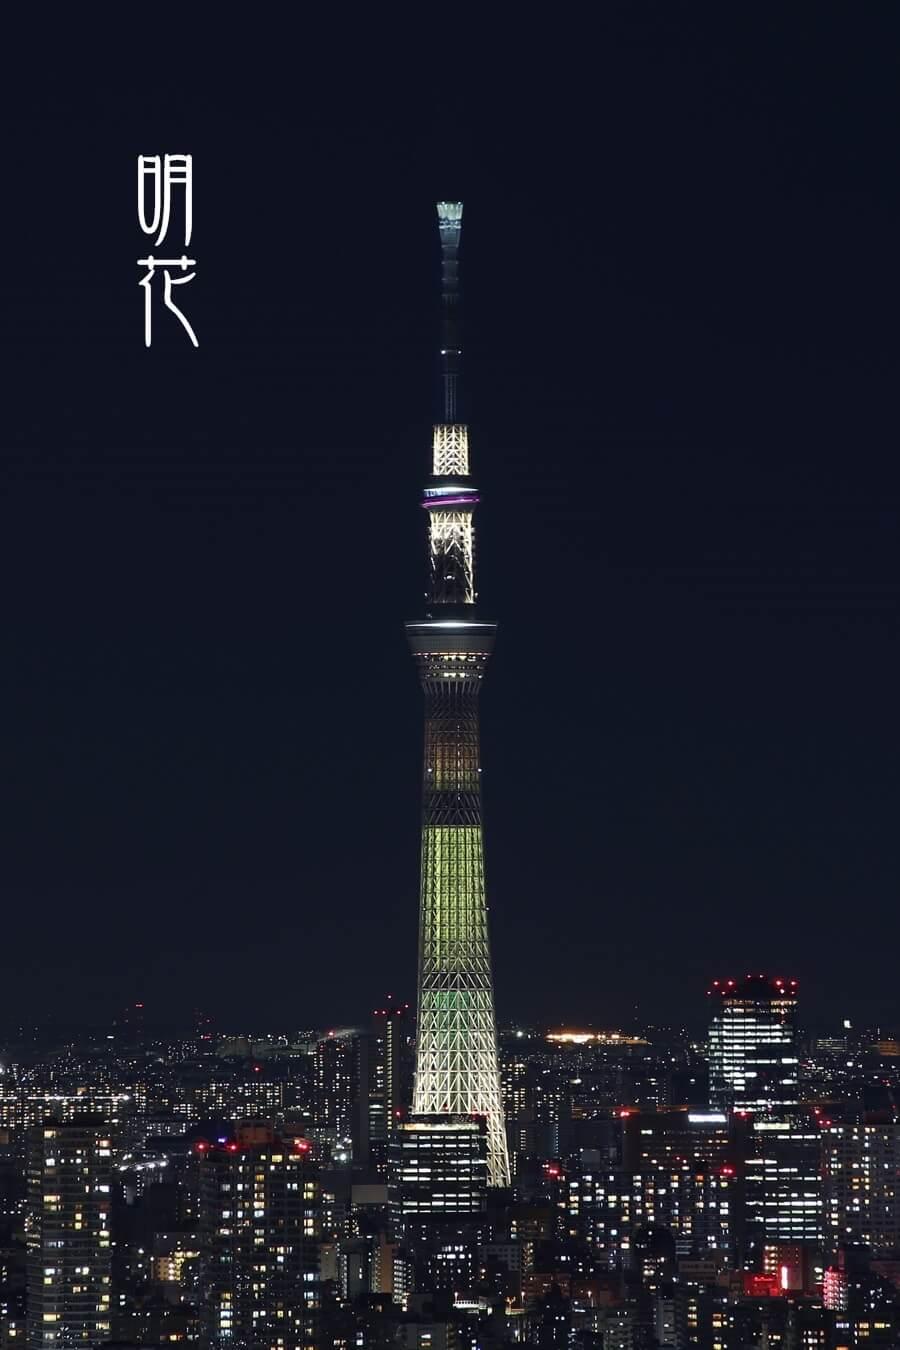 東京スカイツリー 東日本大震災 明花 tokyo_skytree (5)